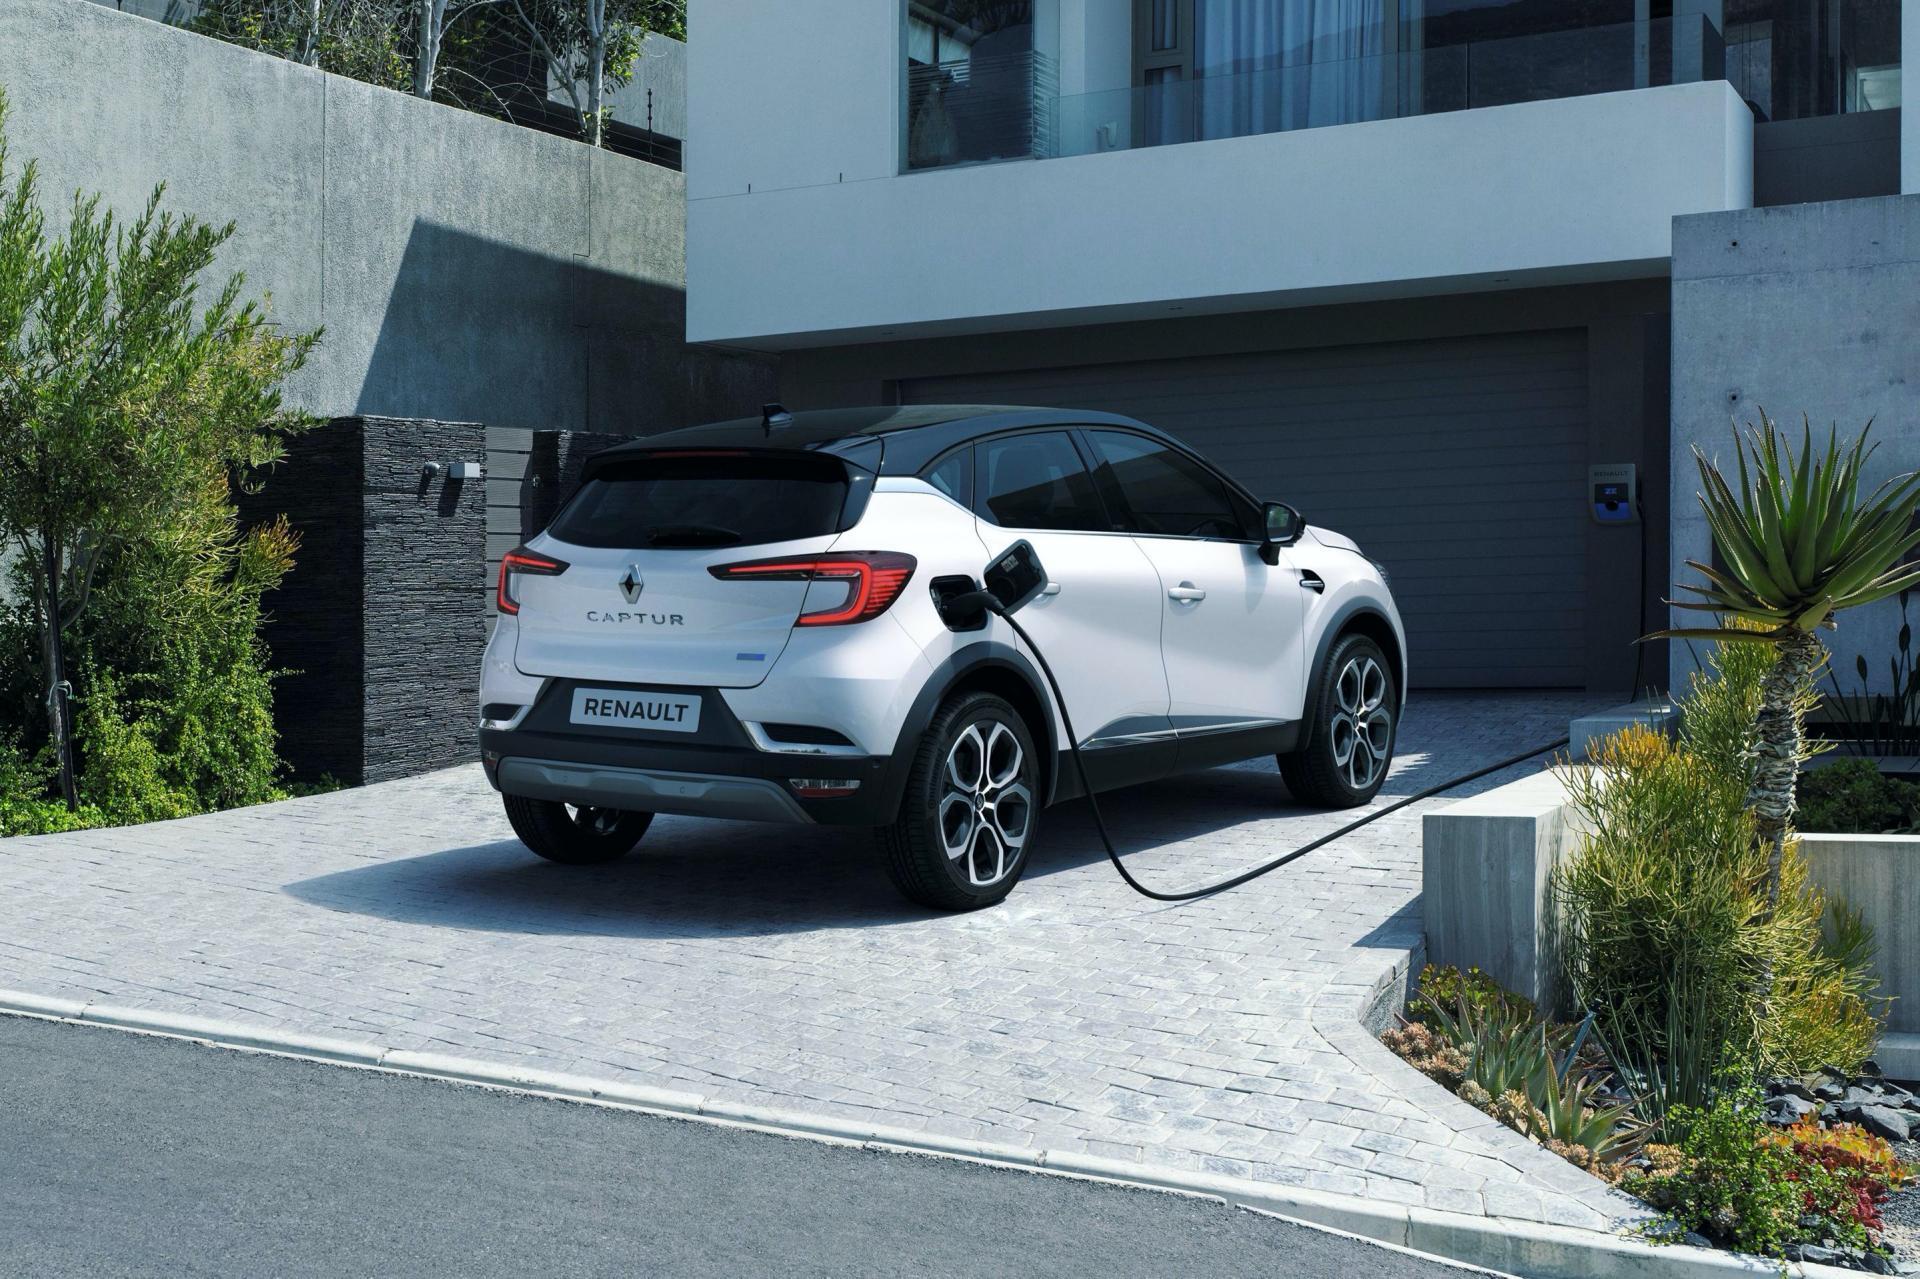 2020-Renault-Captur-E-Tech-plug-in-hybrid-13